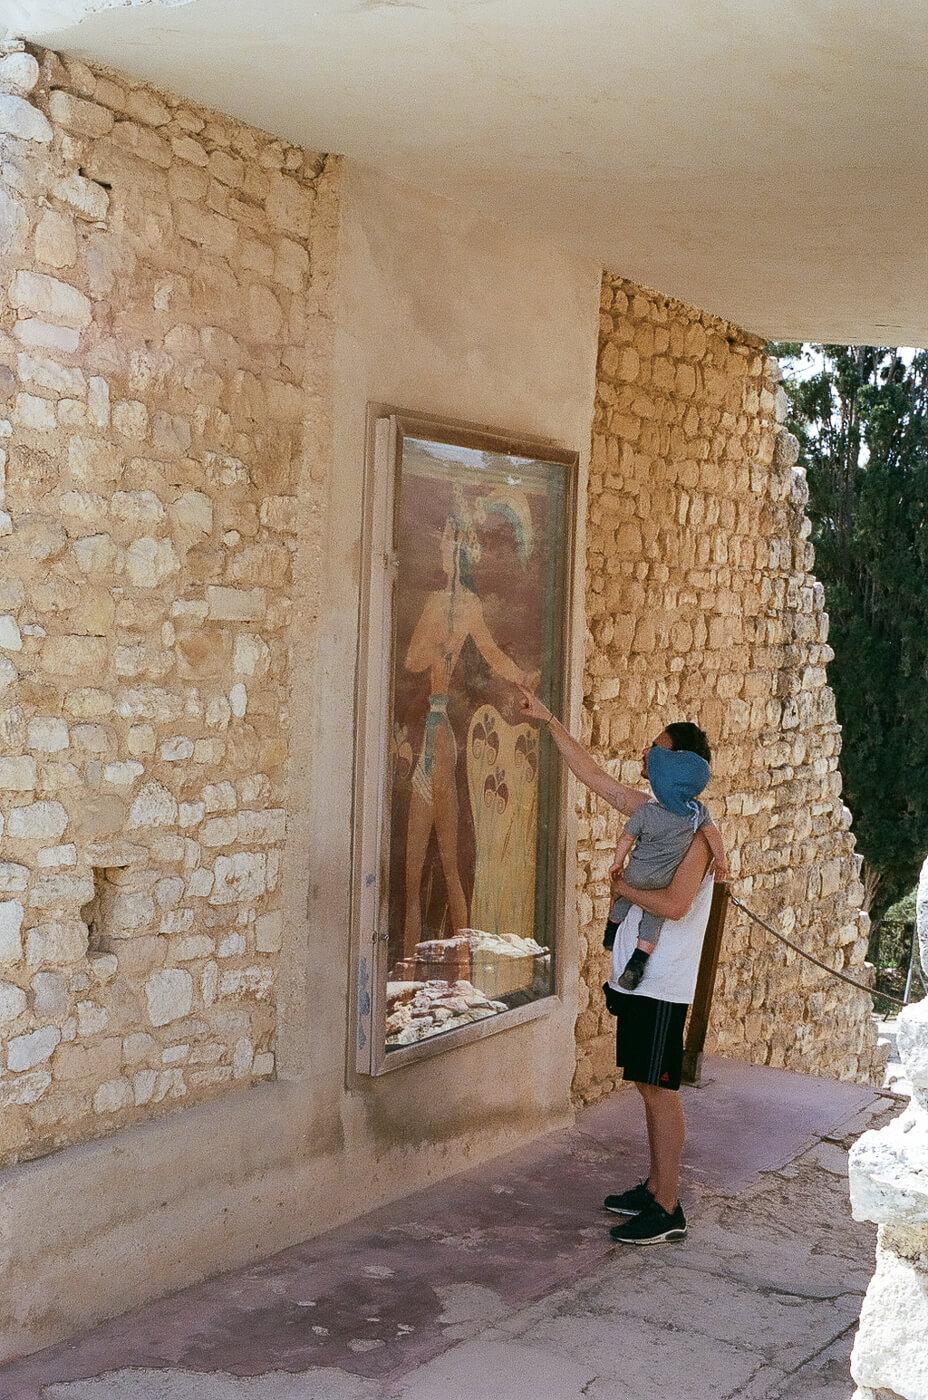 Greece Ruins-2@2x.jpg